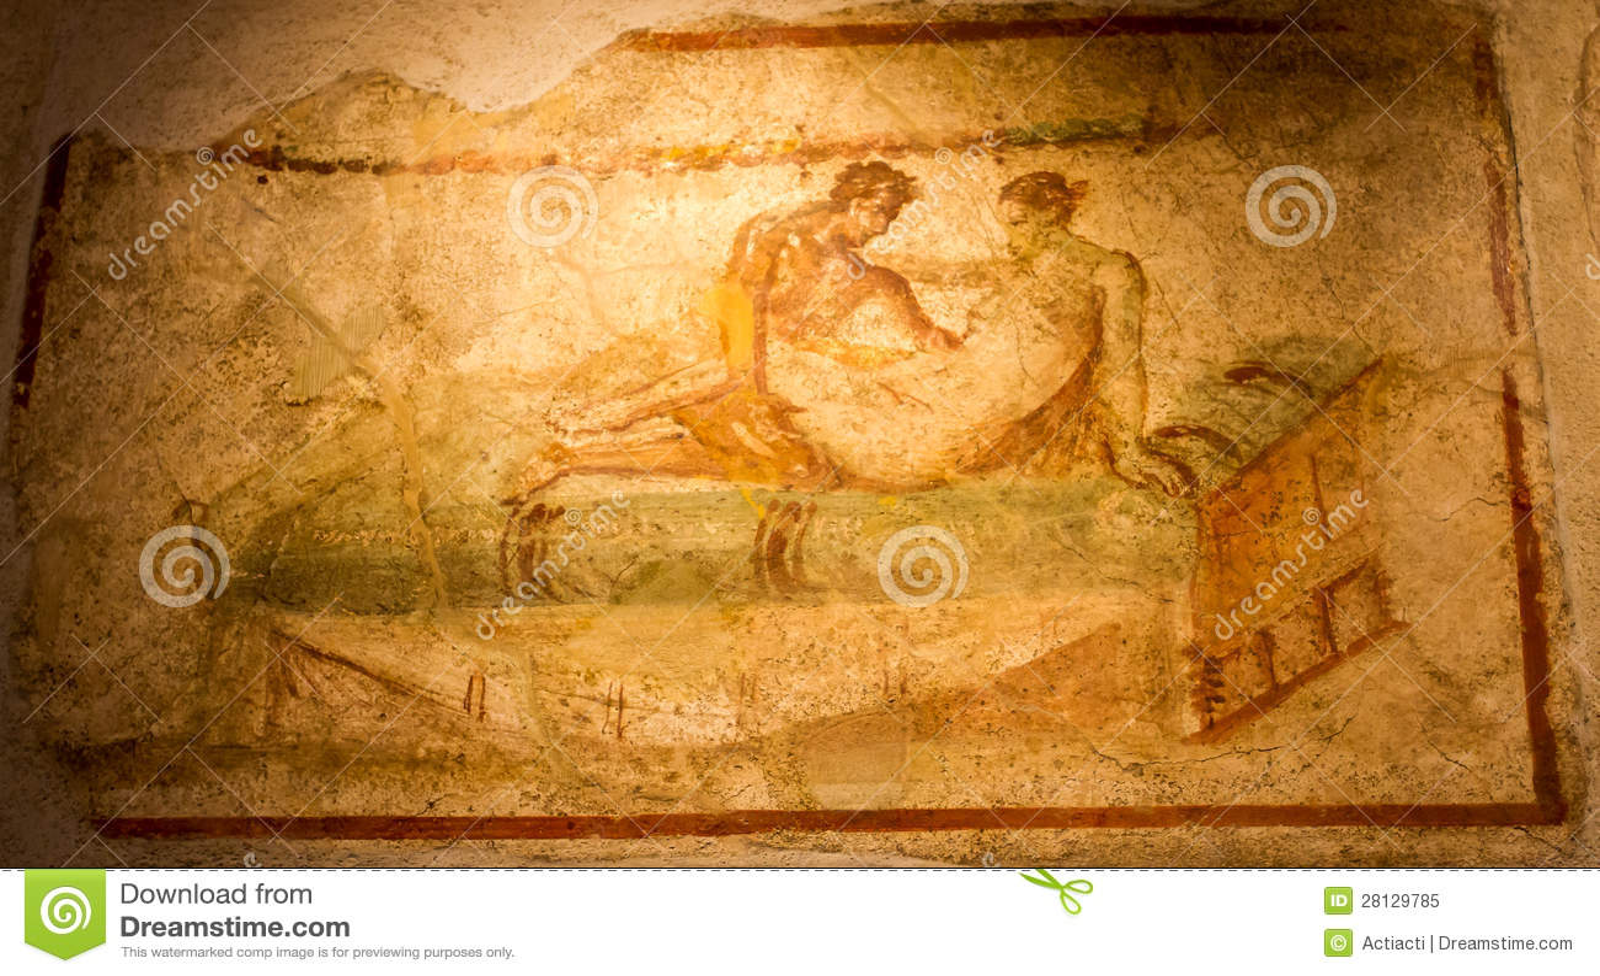 Ancient Fresco In Pompeii Royalty Free Stock Photo - Image 28129785-8845